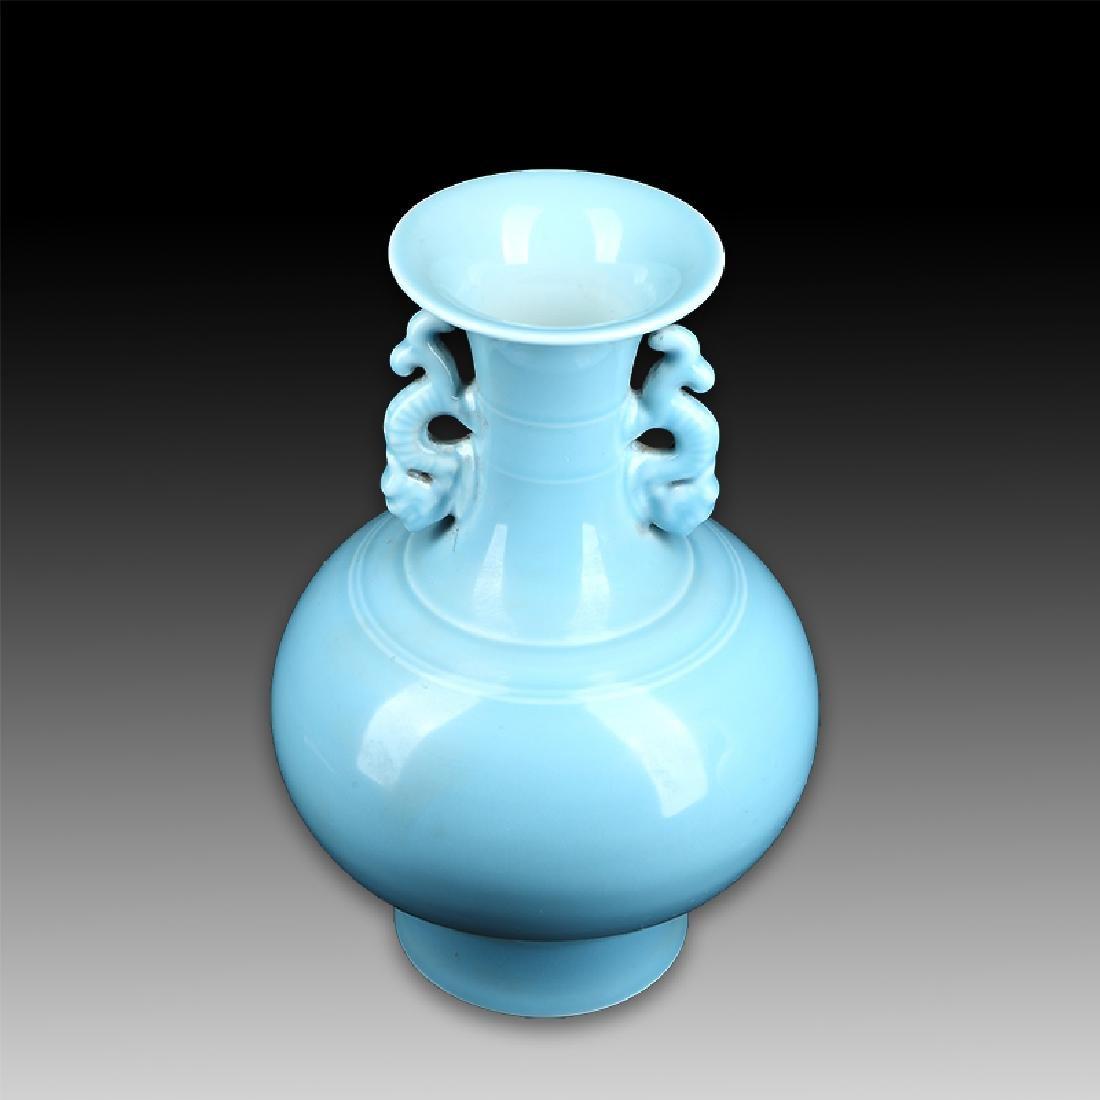 Chinese Pale Celadon Porcelain Bottle Vase - 3